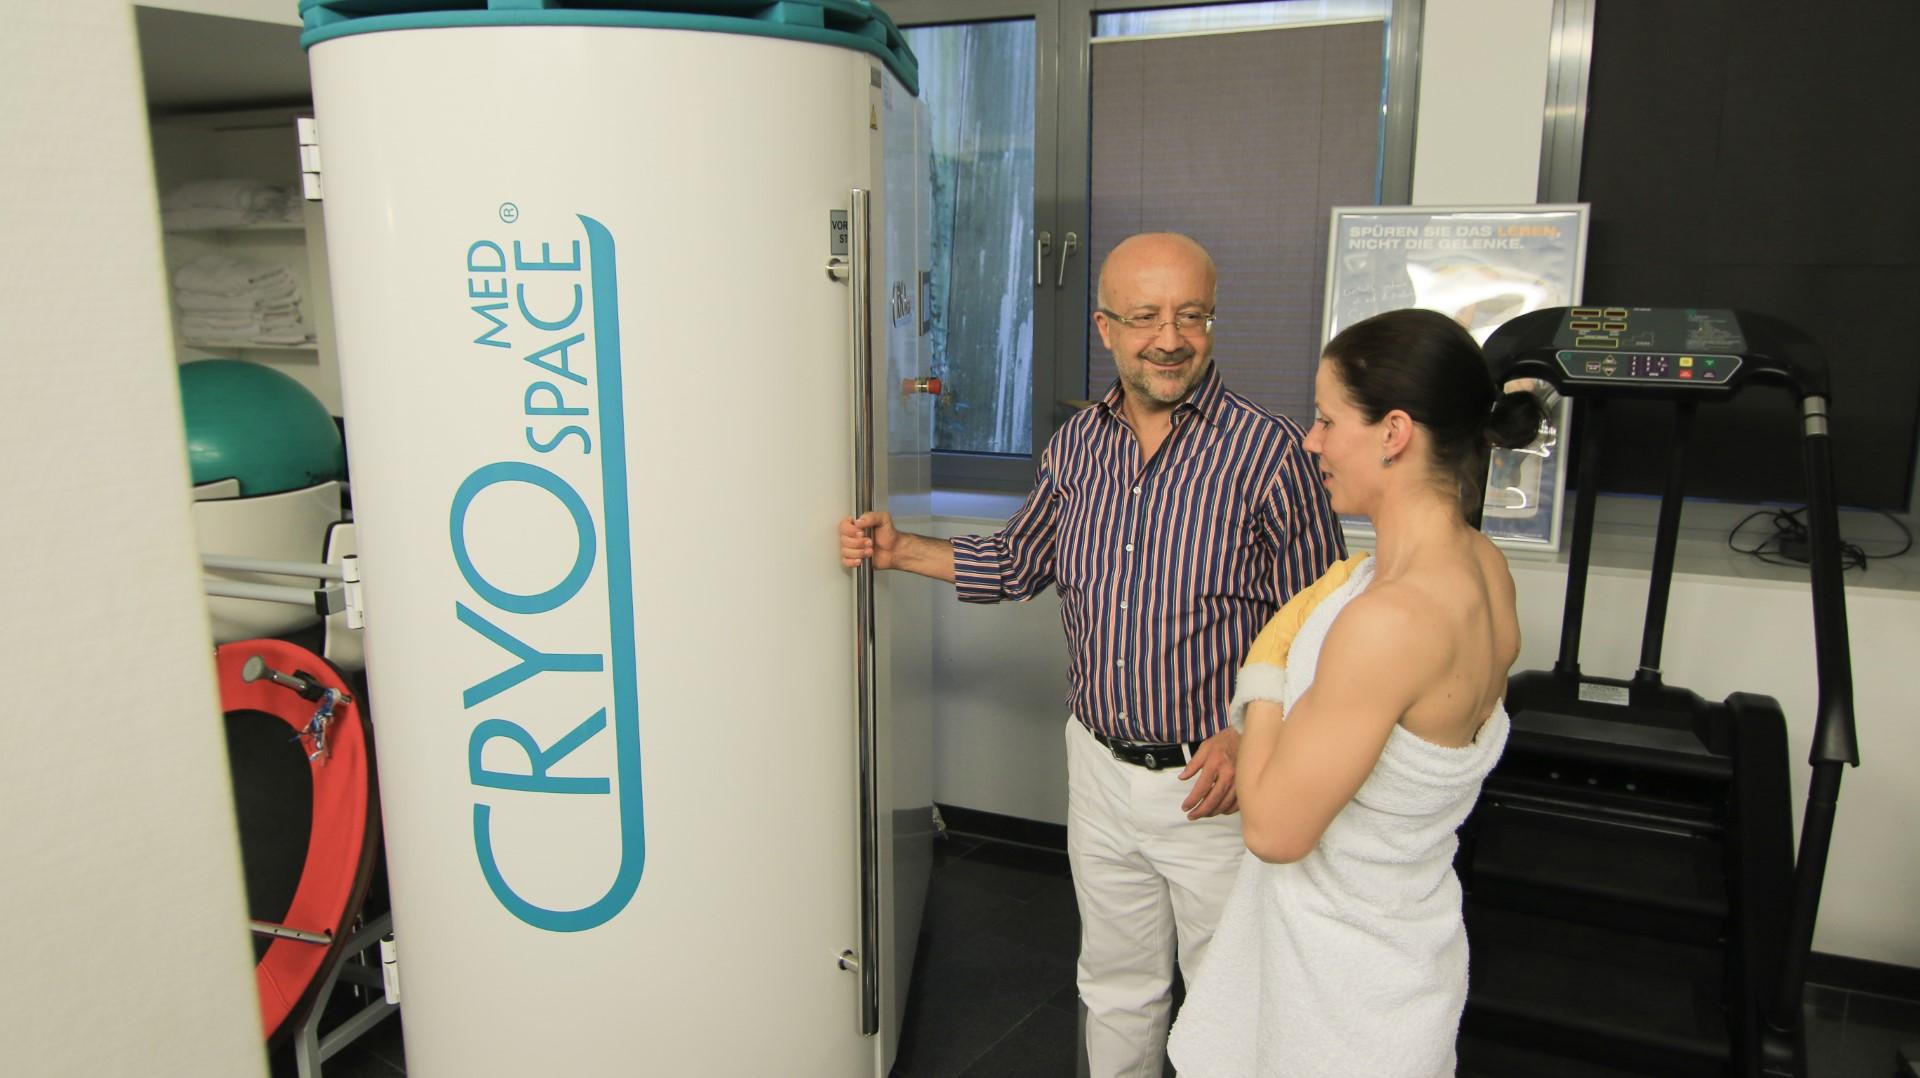 Physikalische und apparative Medizin - Kältekammer CryoSpace Med